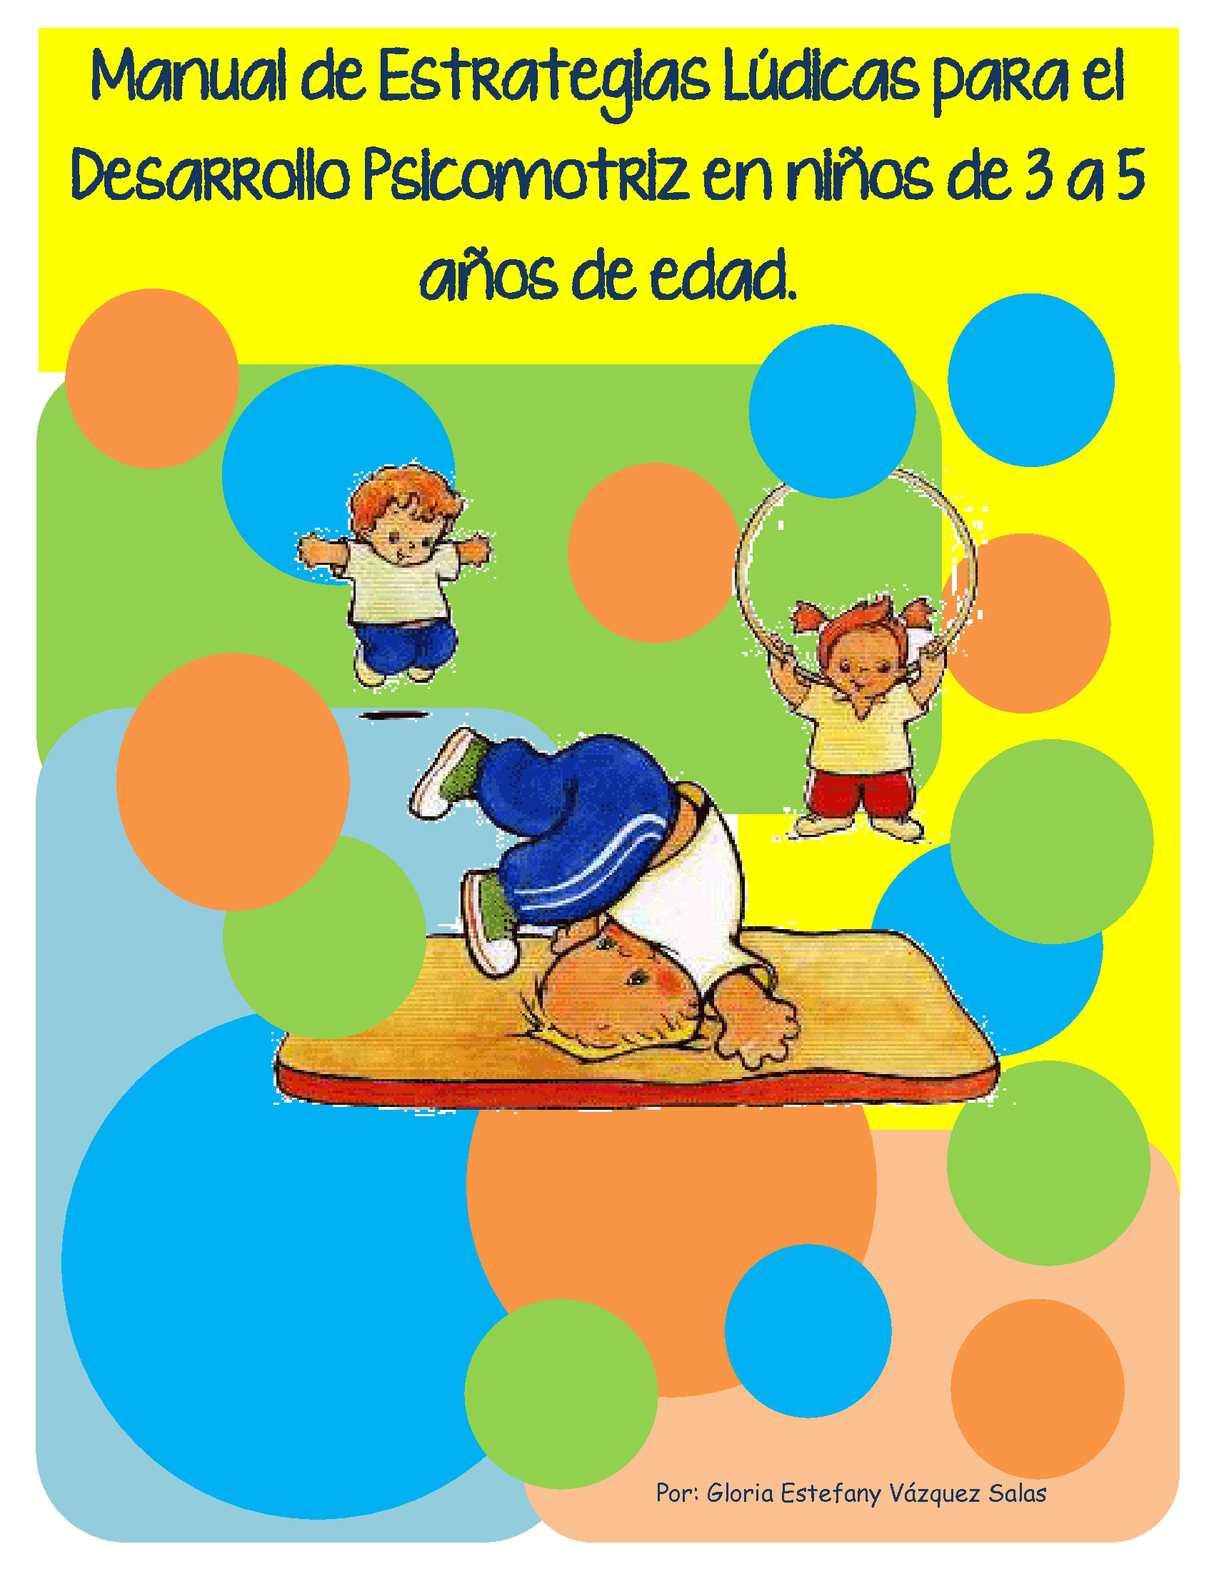 Calam o manual de estrategias l dicas para el desarrollo for Actividades pedagogicas para ninos de 2 a 3 anos